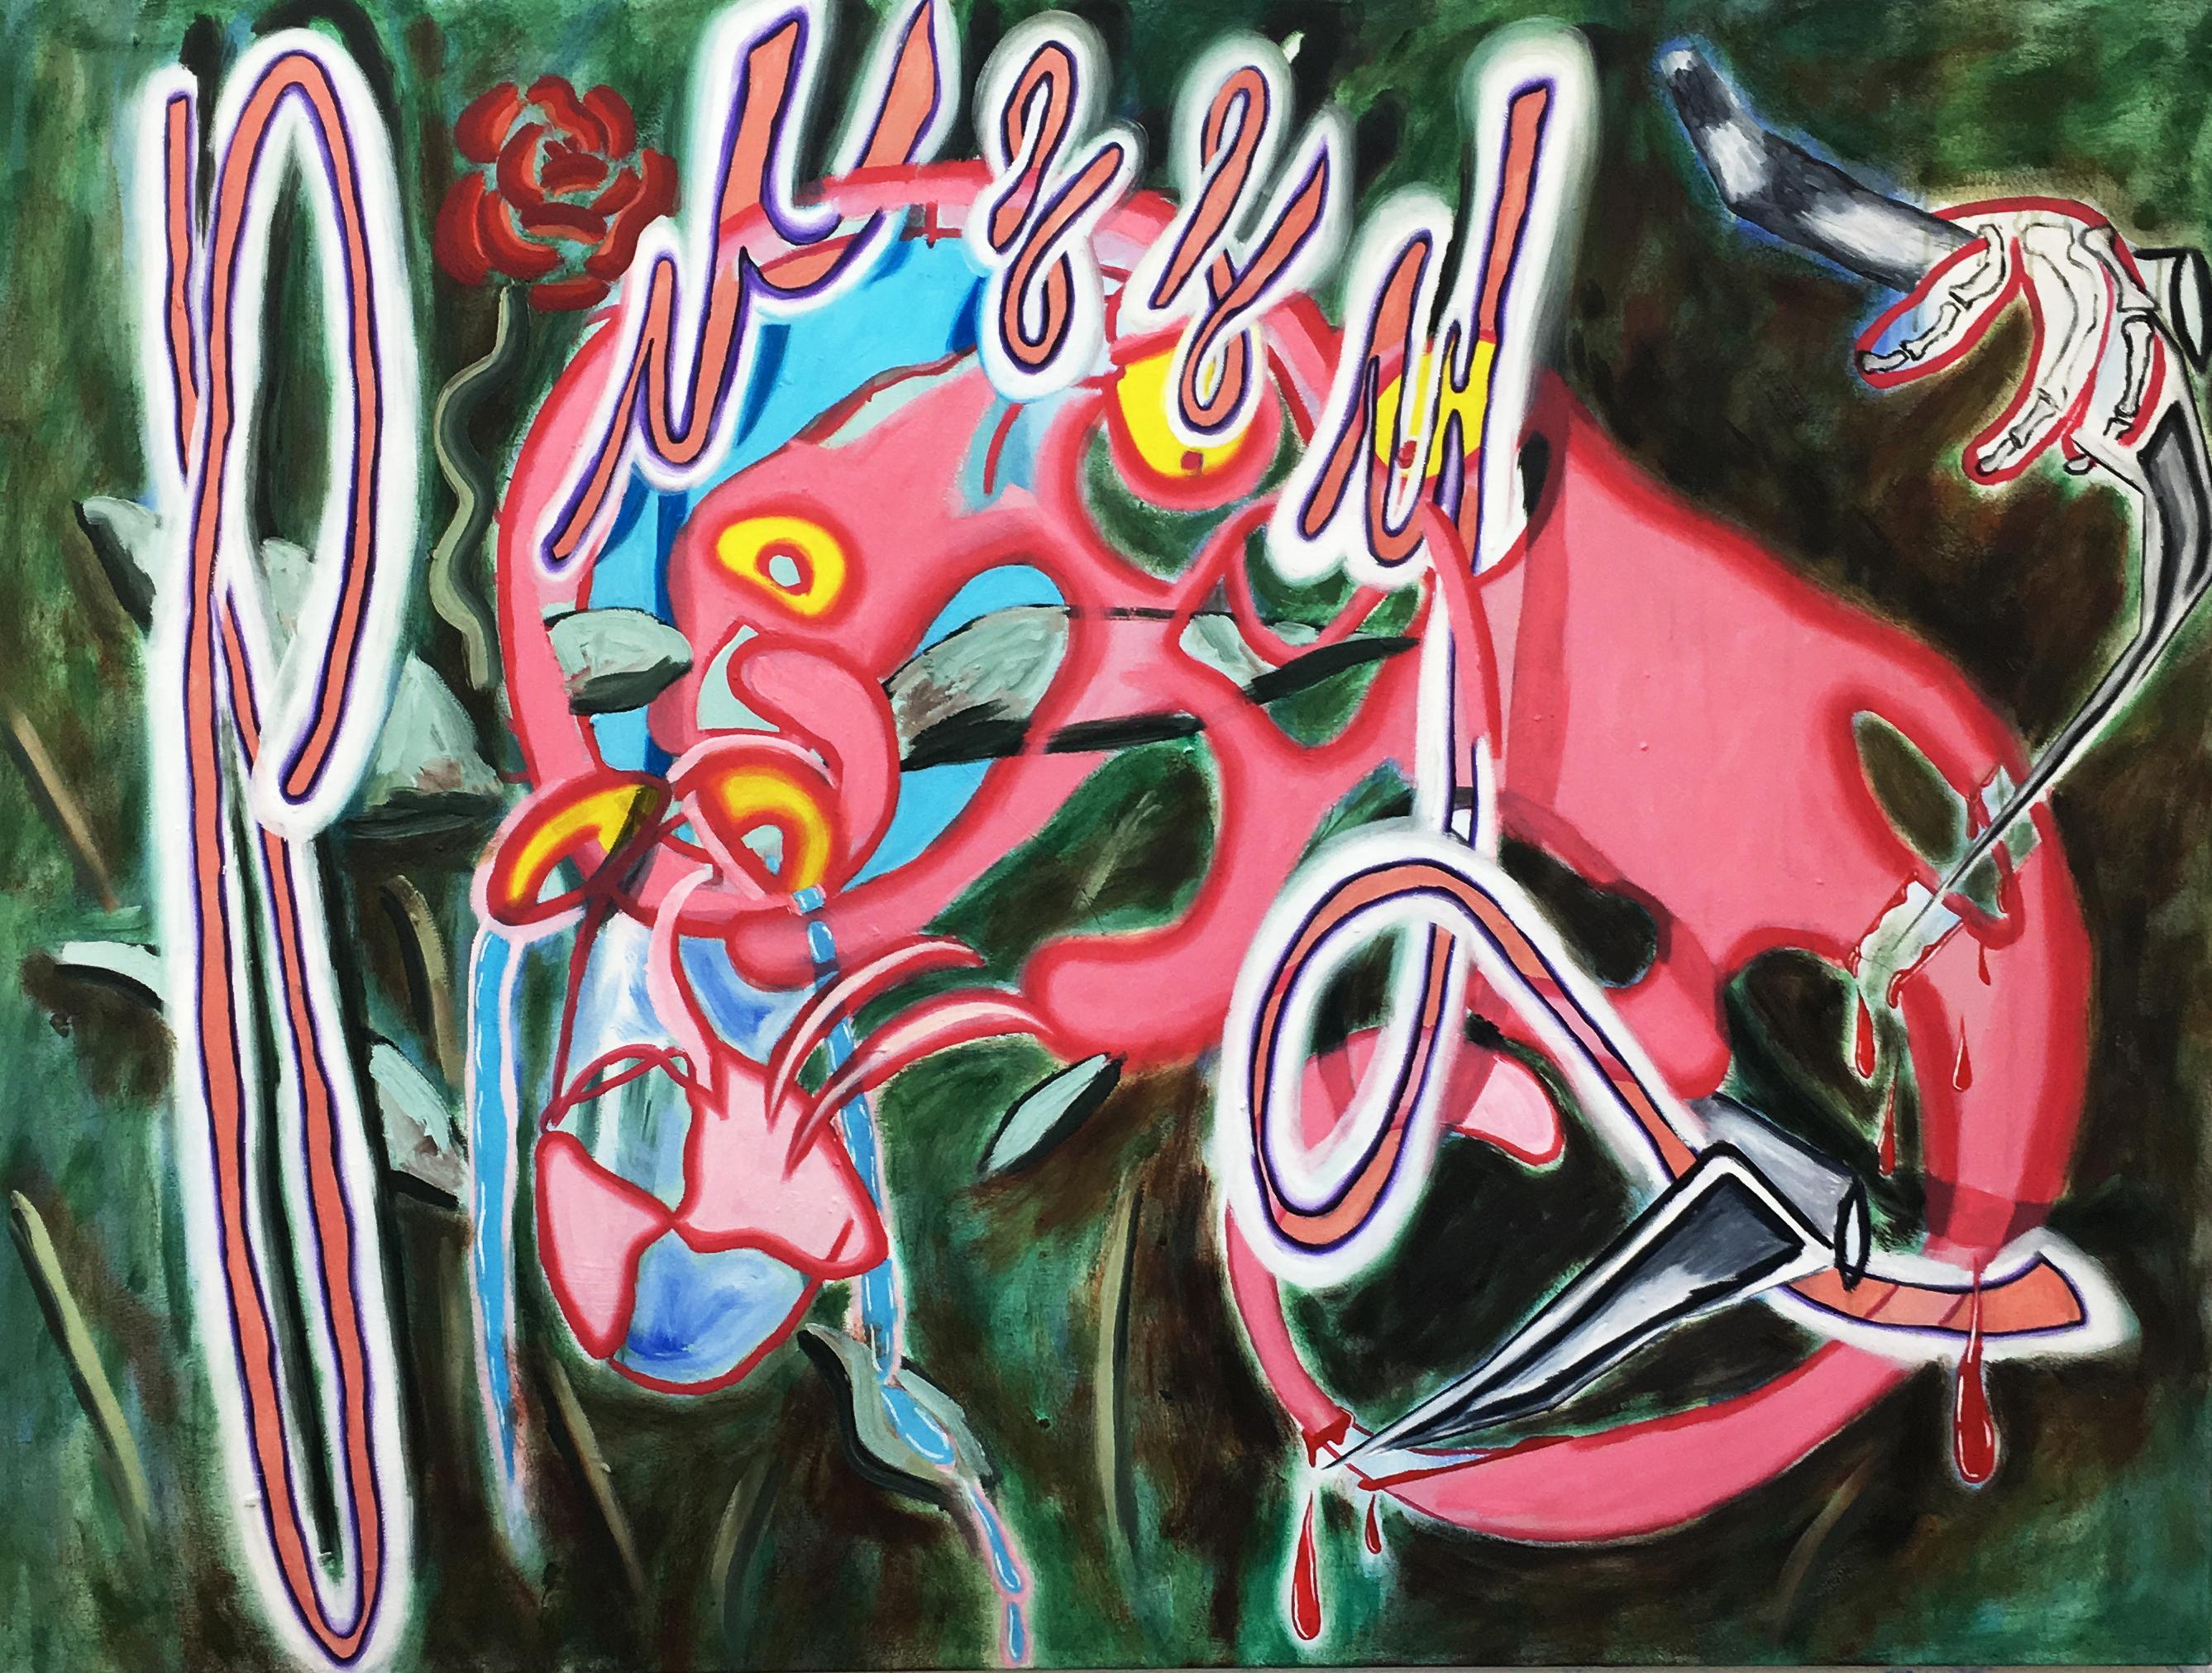 India Nielsen, Knip Repnathr, 2017, Oil and acrylic on canvas FAD Magazine